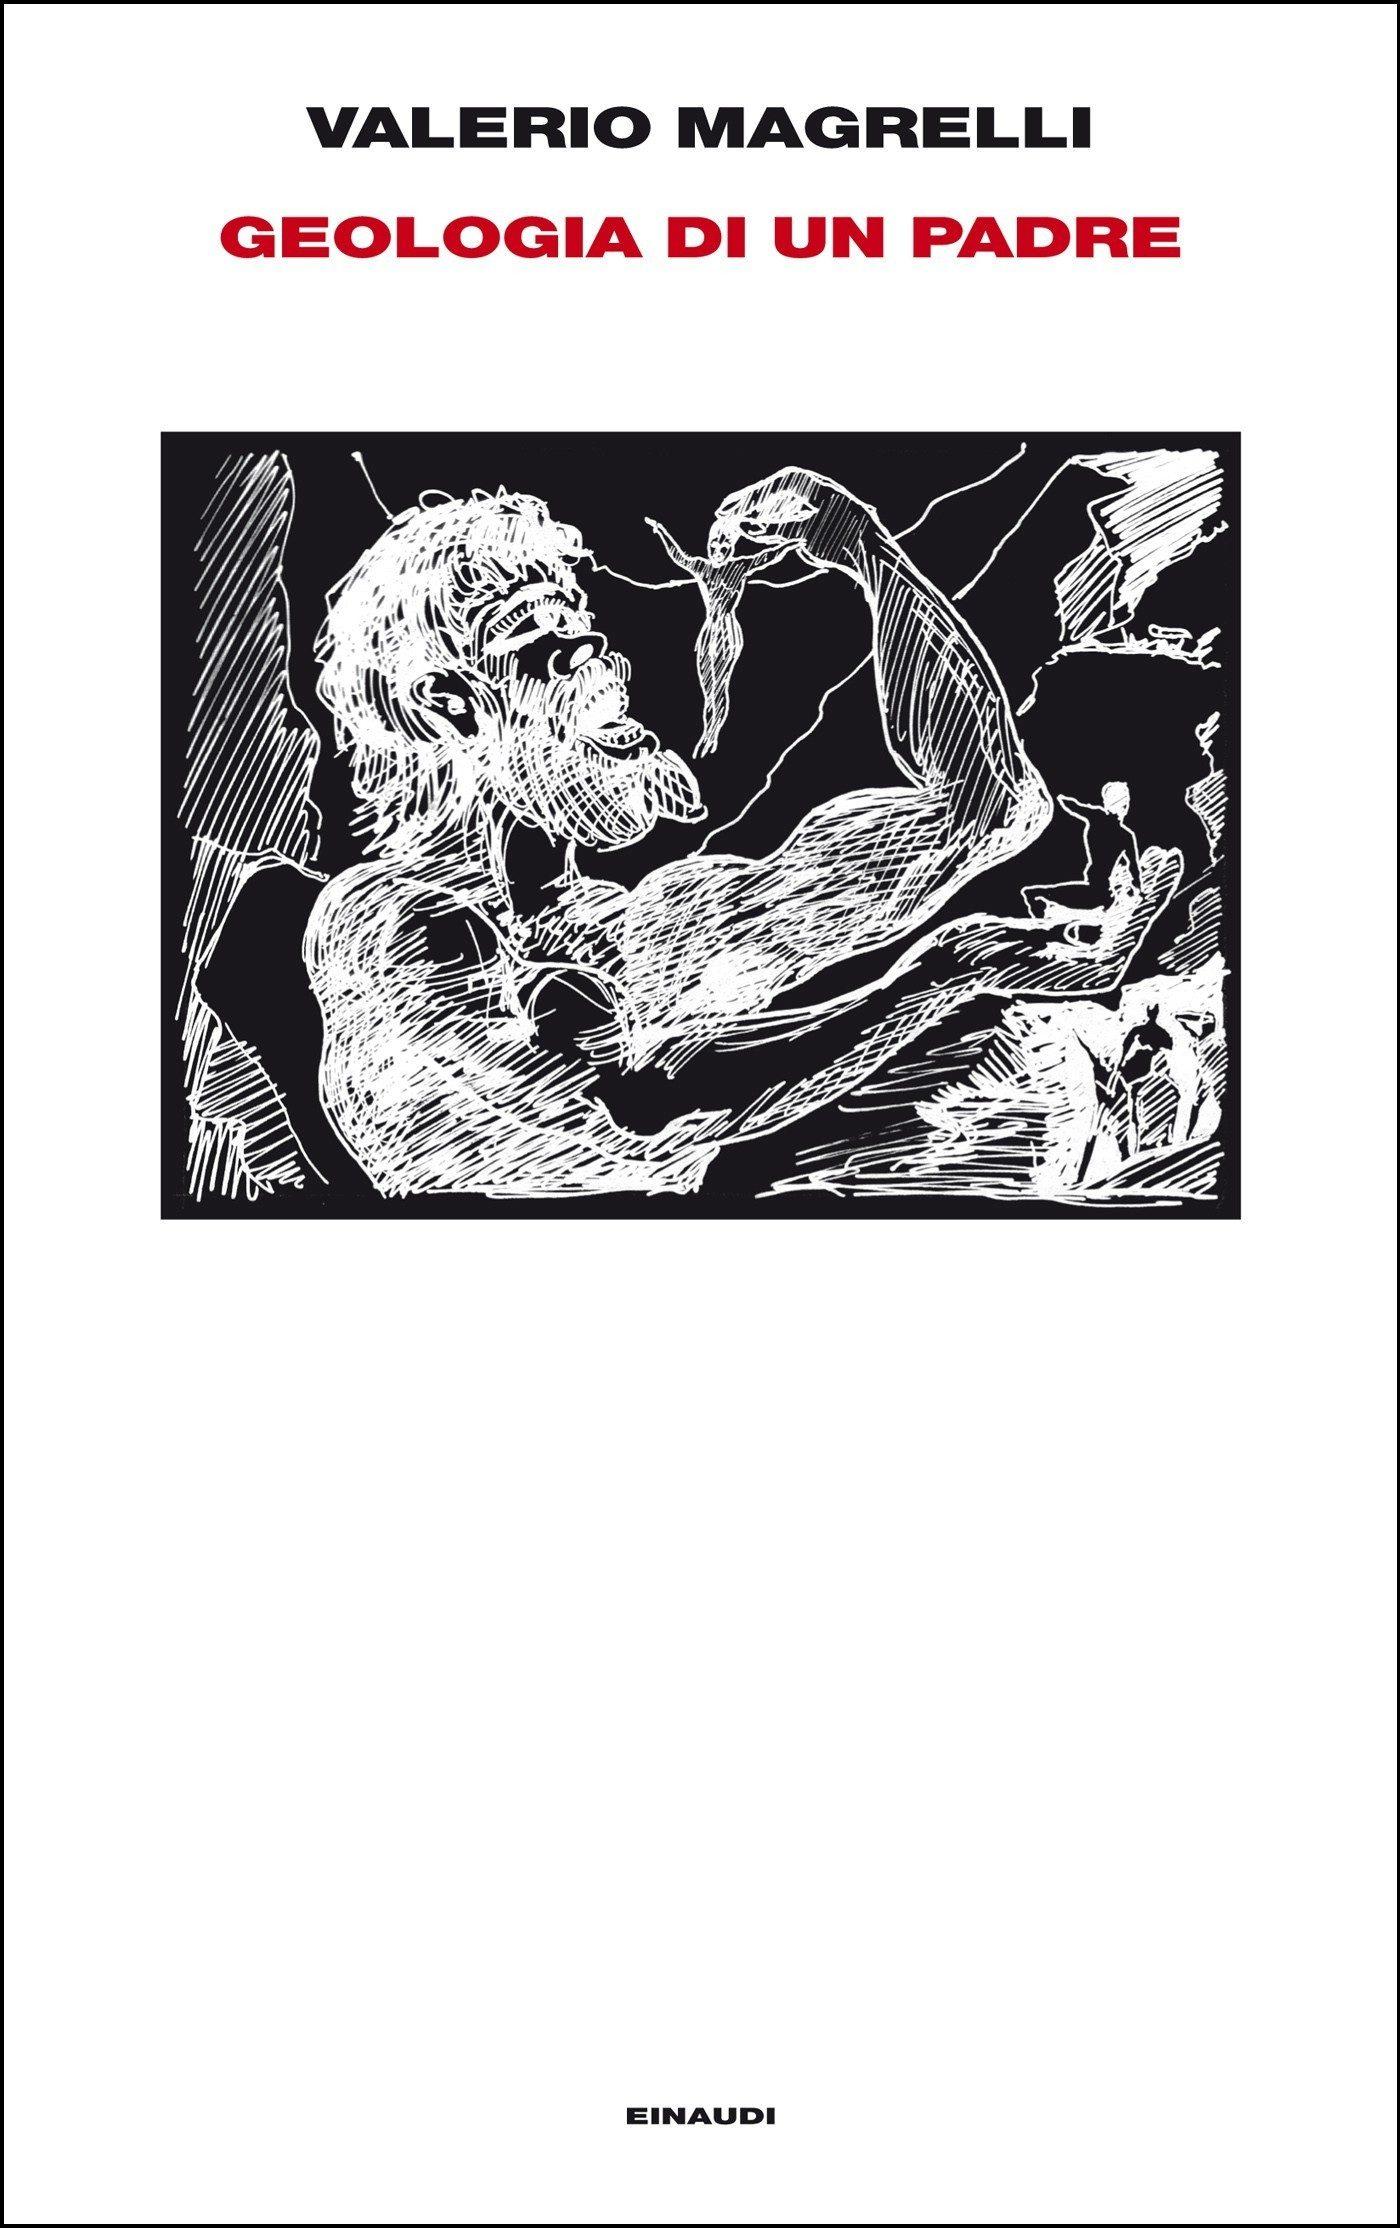 Risultati immagini per Geologia di un padre di Valerio Magrelli (Einaudi, 2016) € 10